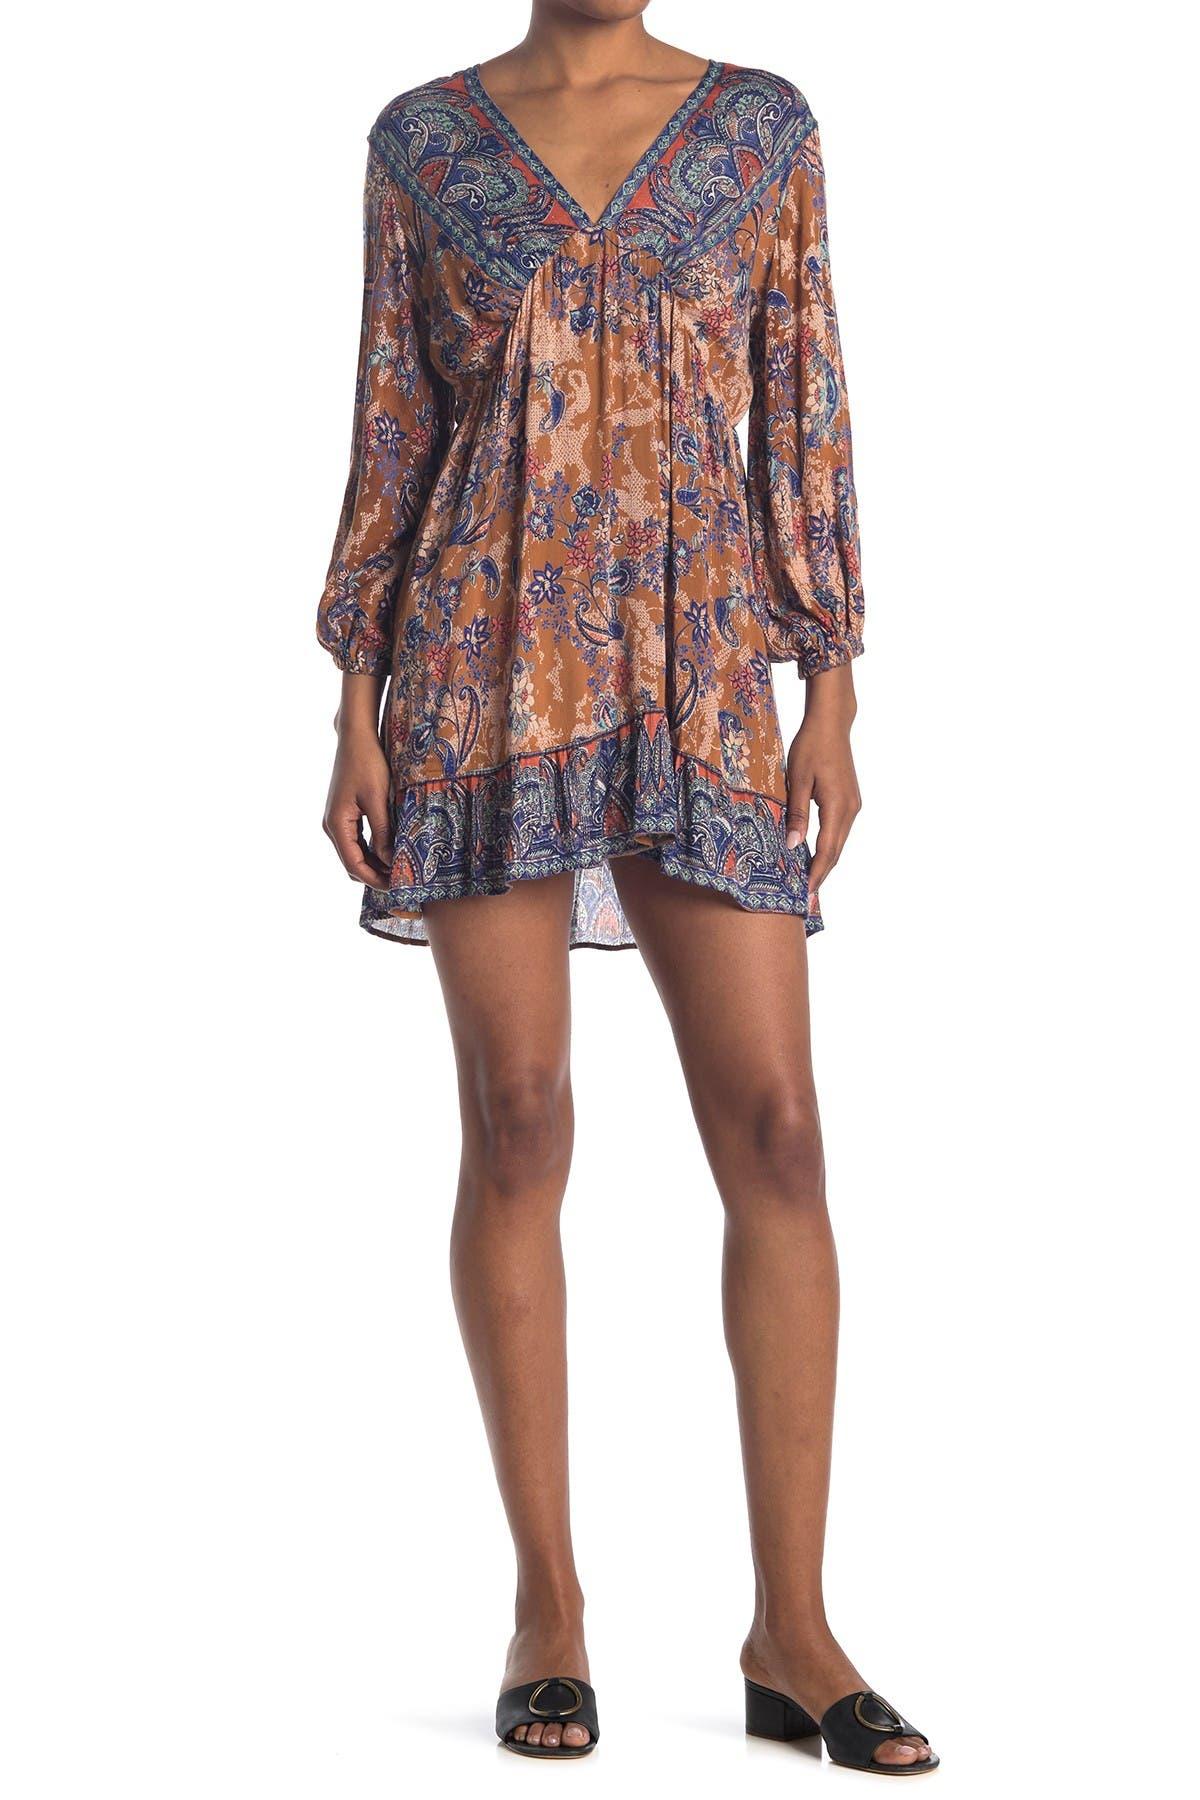 Image of Angie V-Neck Paisley Print Dress